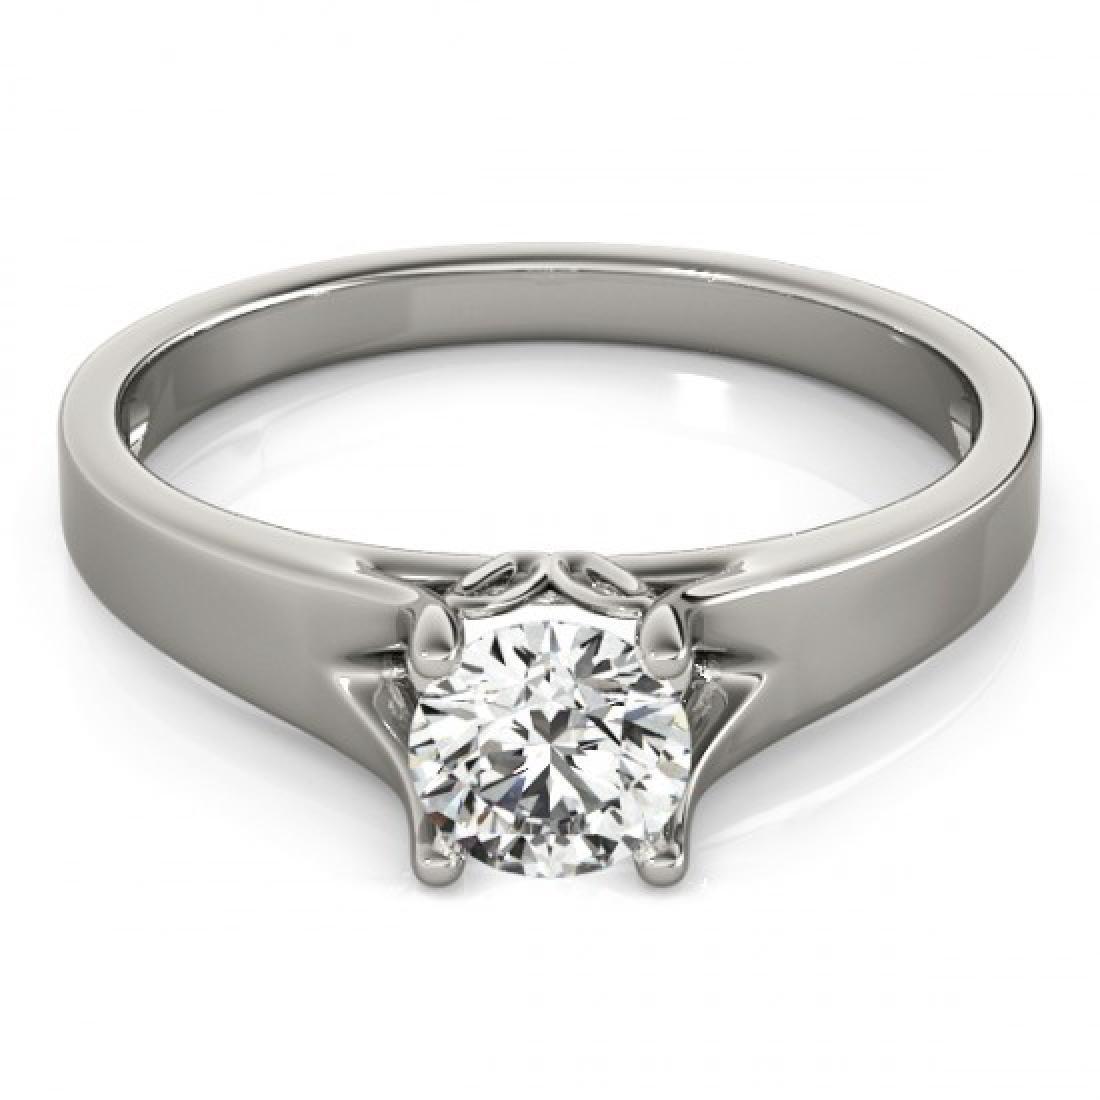 1 CTW Certified VS/SI Diamond Solitaire Ring 14K White